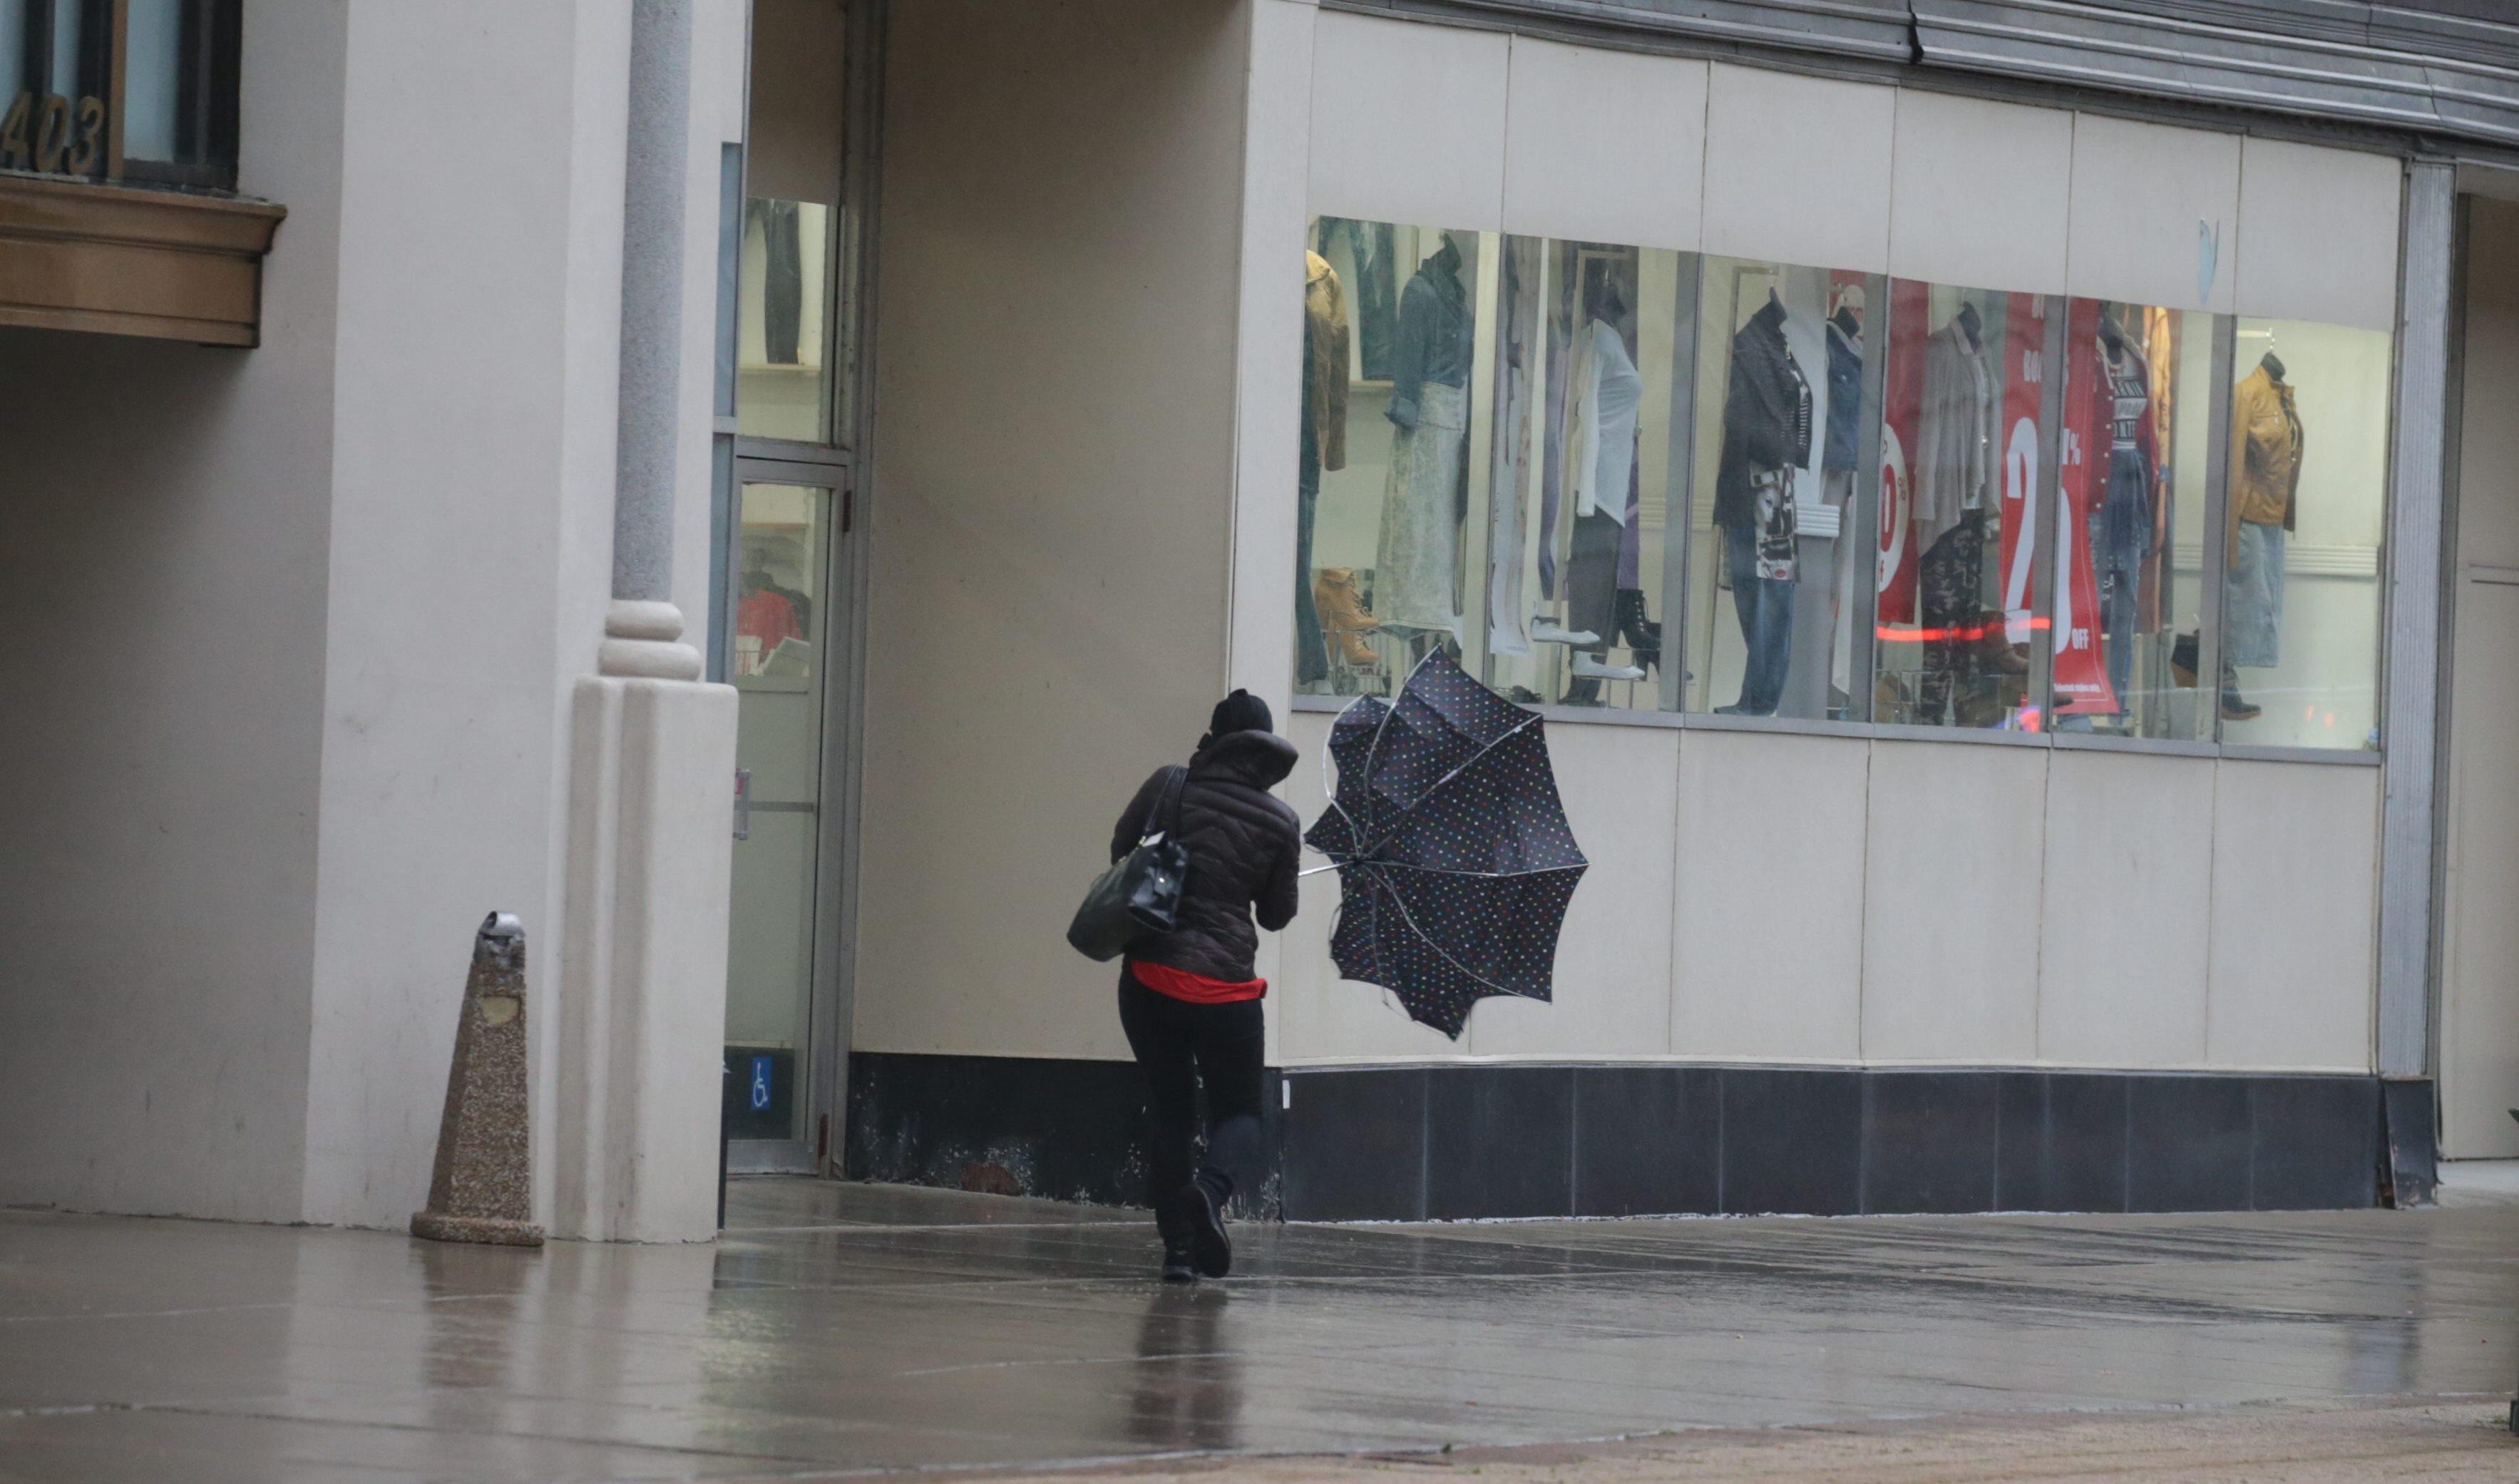 A high wind advisory goes into effect at 1 p.m. today. (John Hickey/Buffalo News)